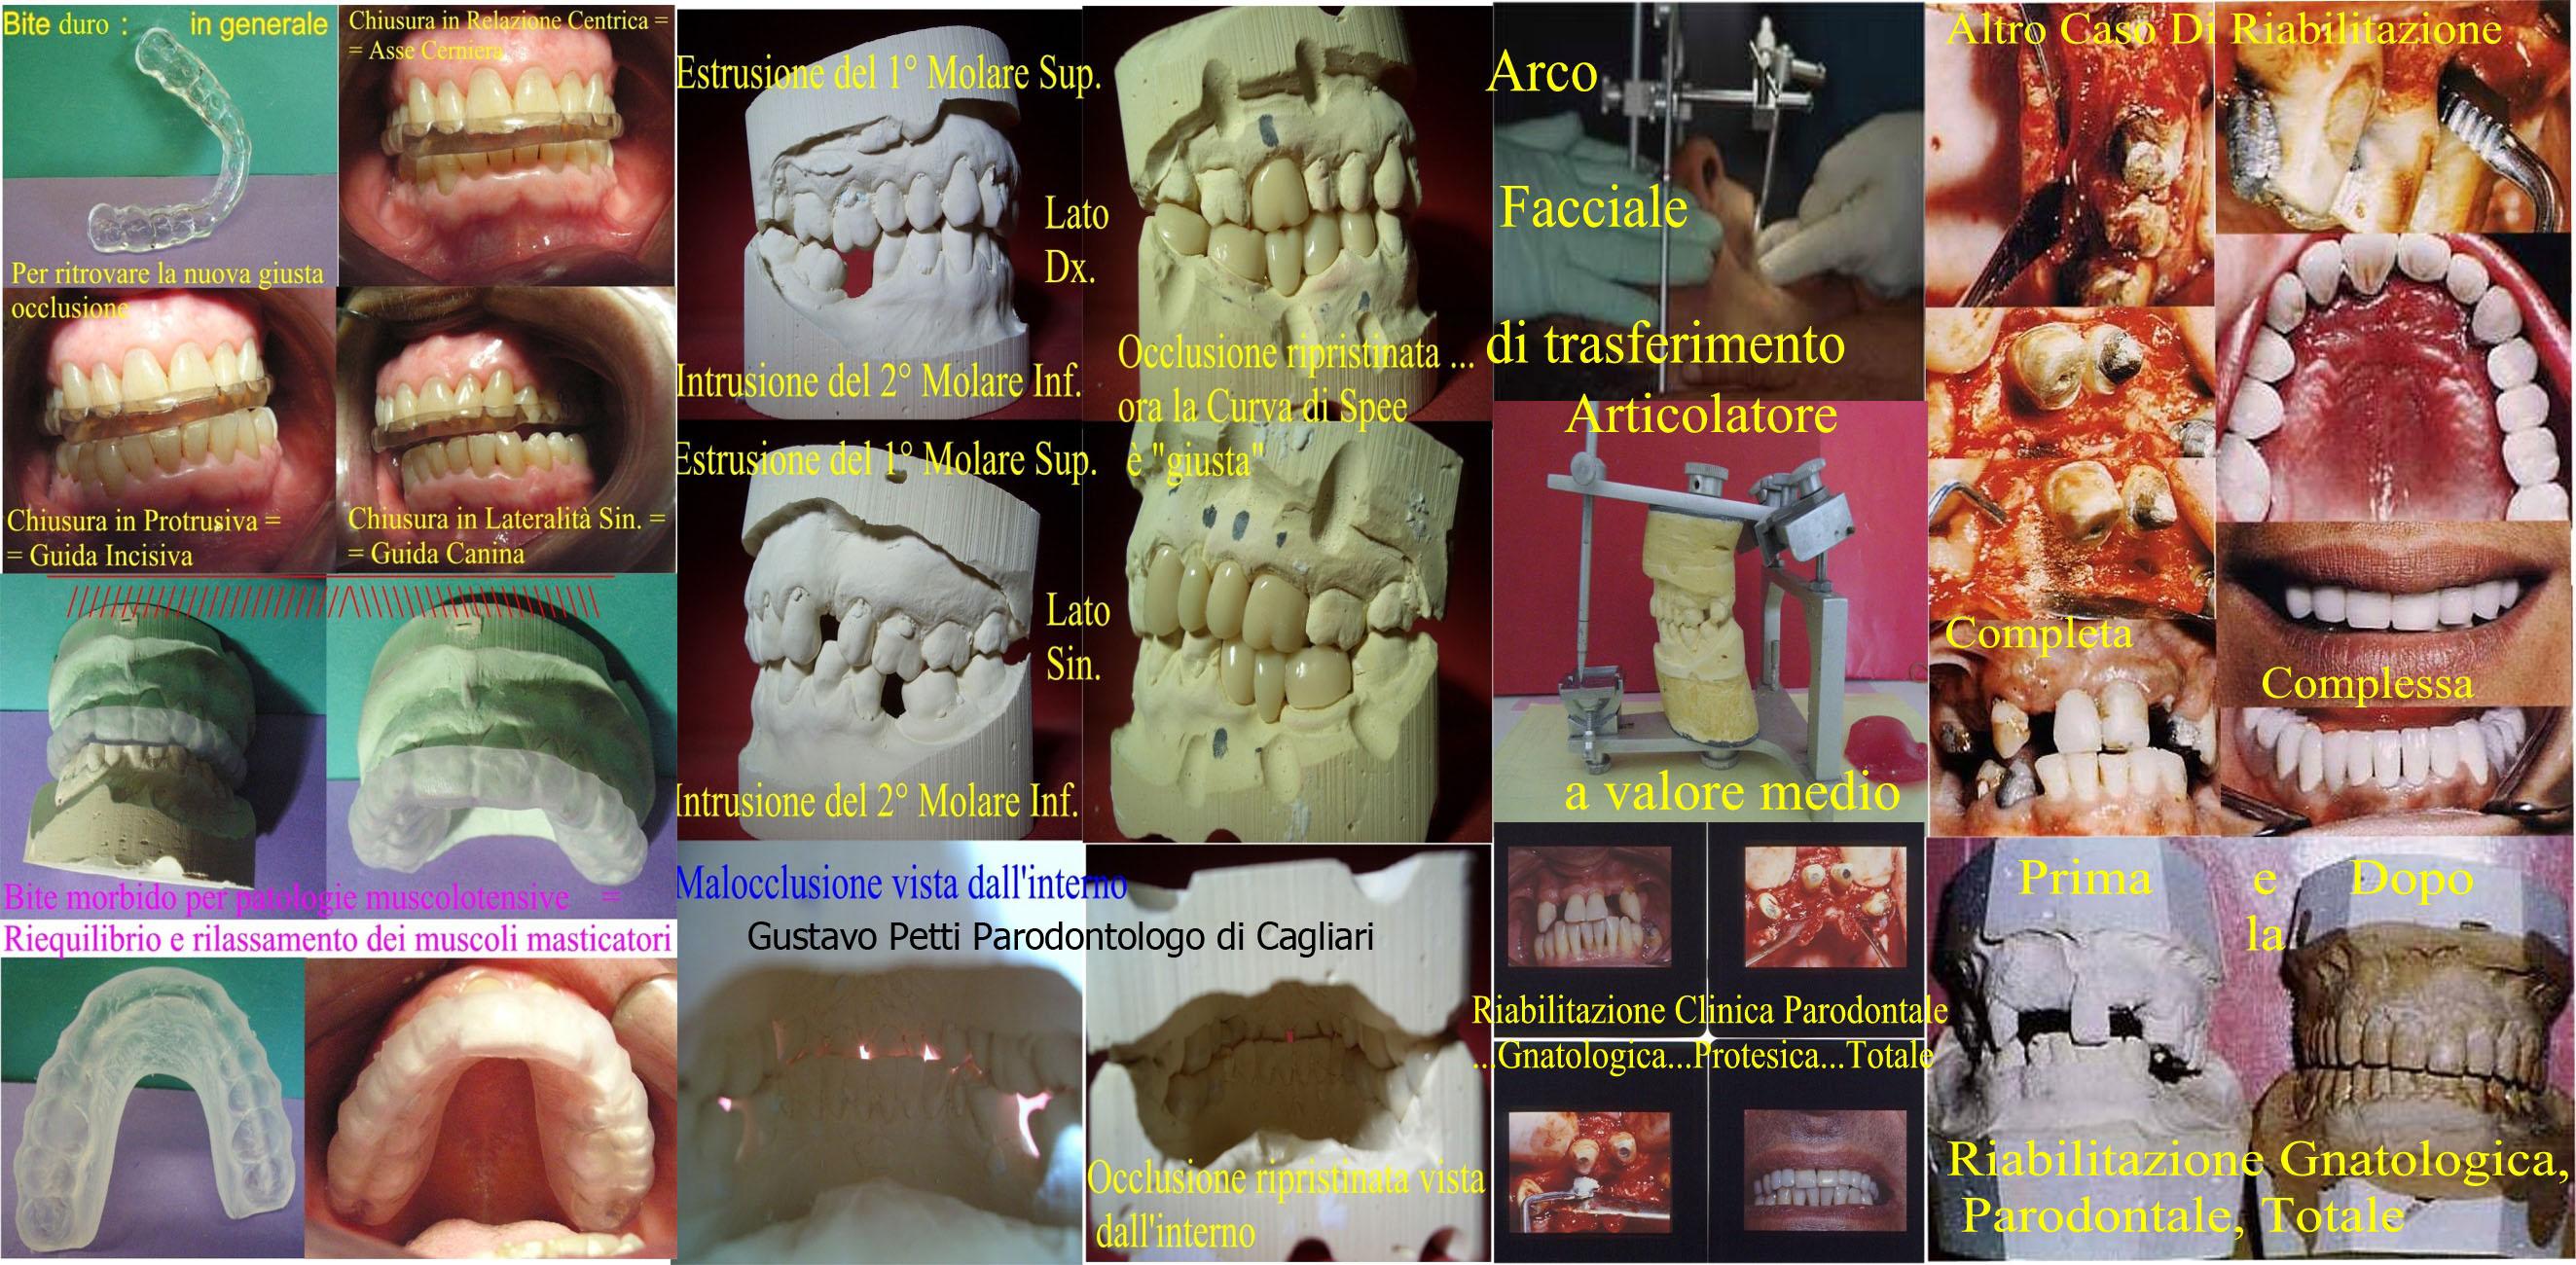 riabilitazione-gnatologica-e-parodontale--266.jpg